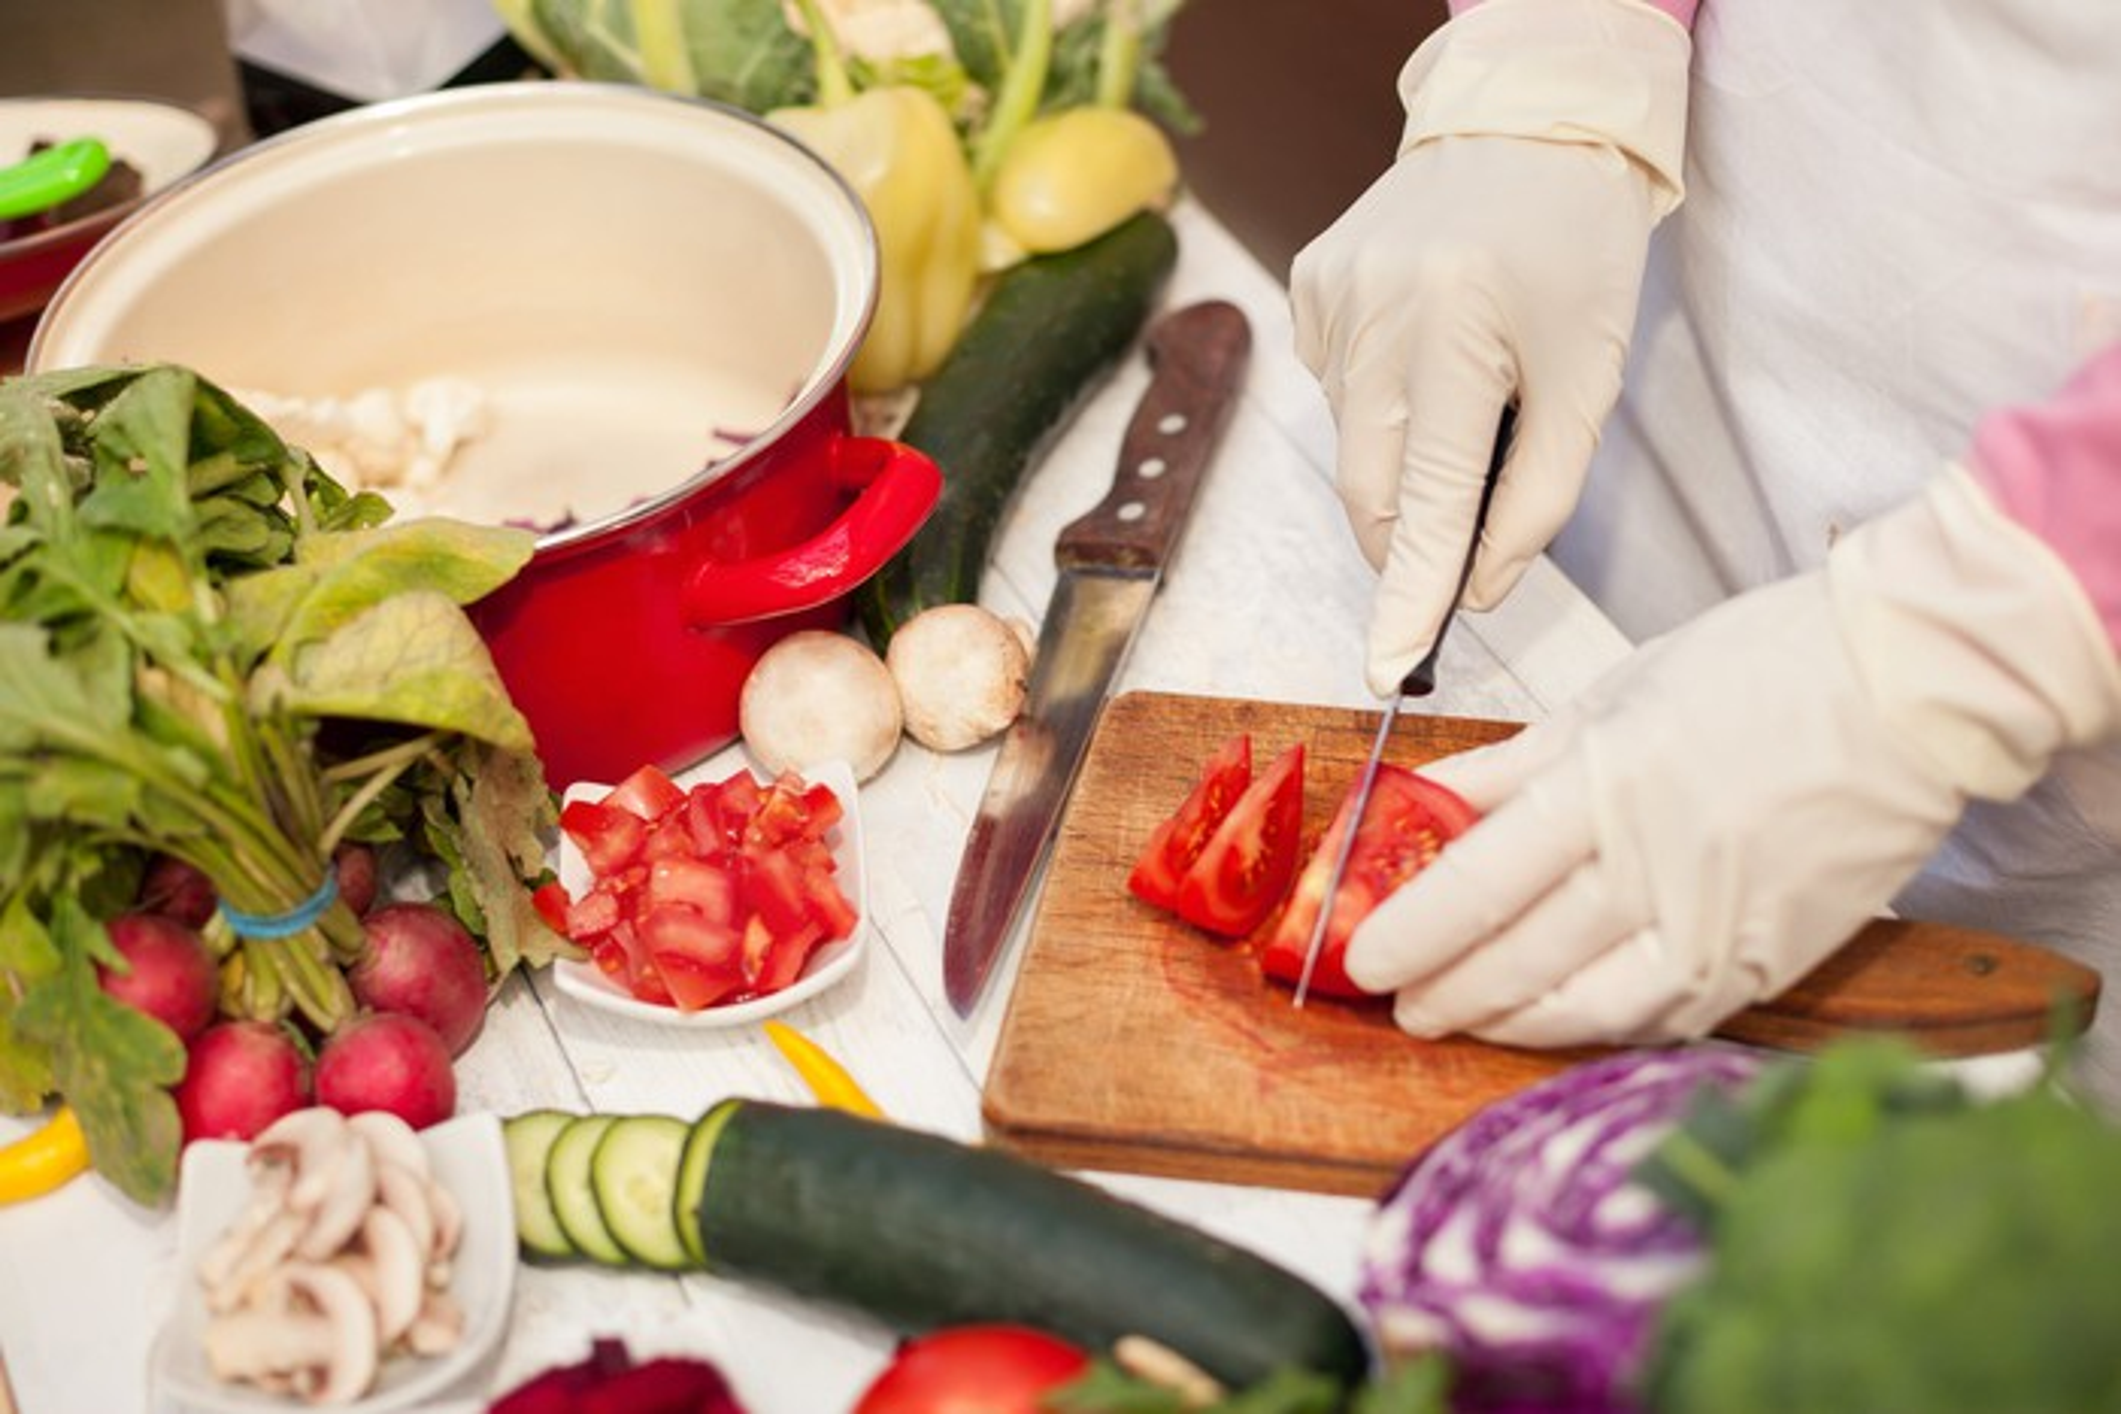 A woman cuts fresh produce.